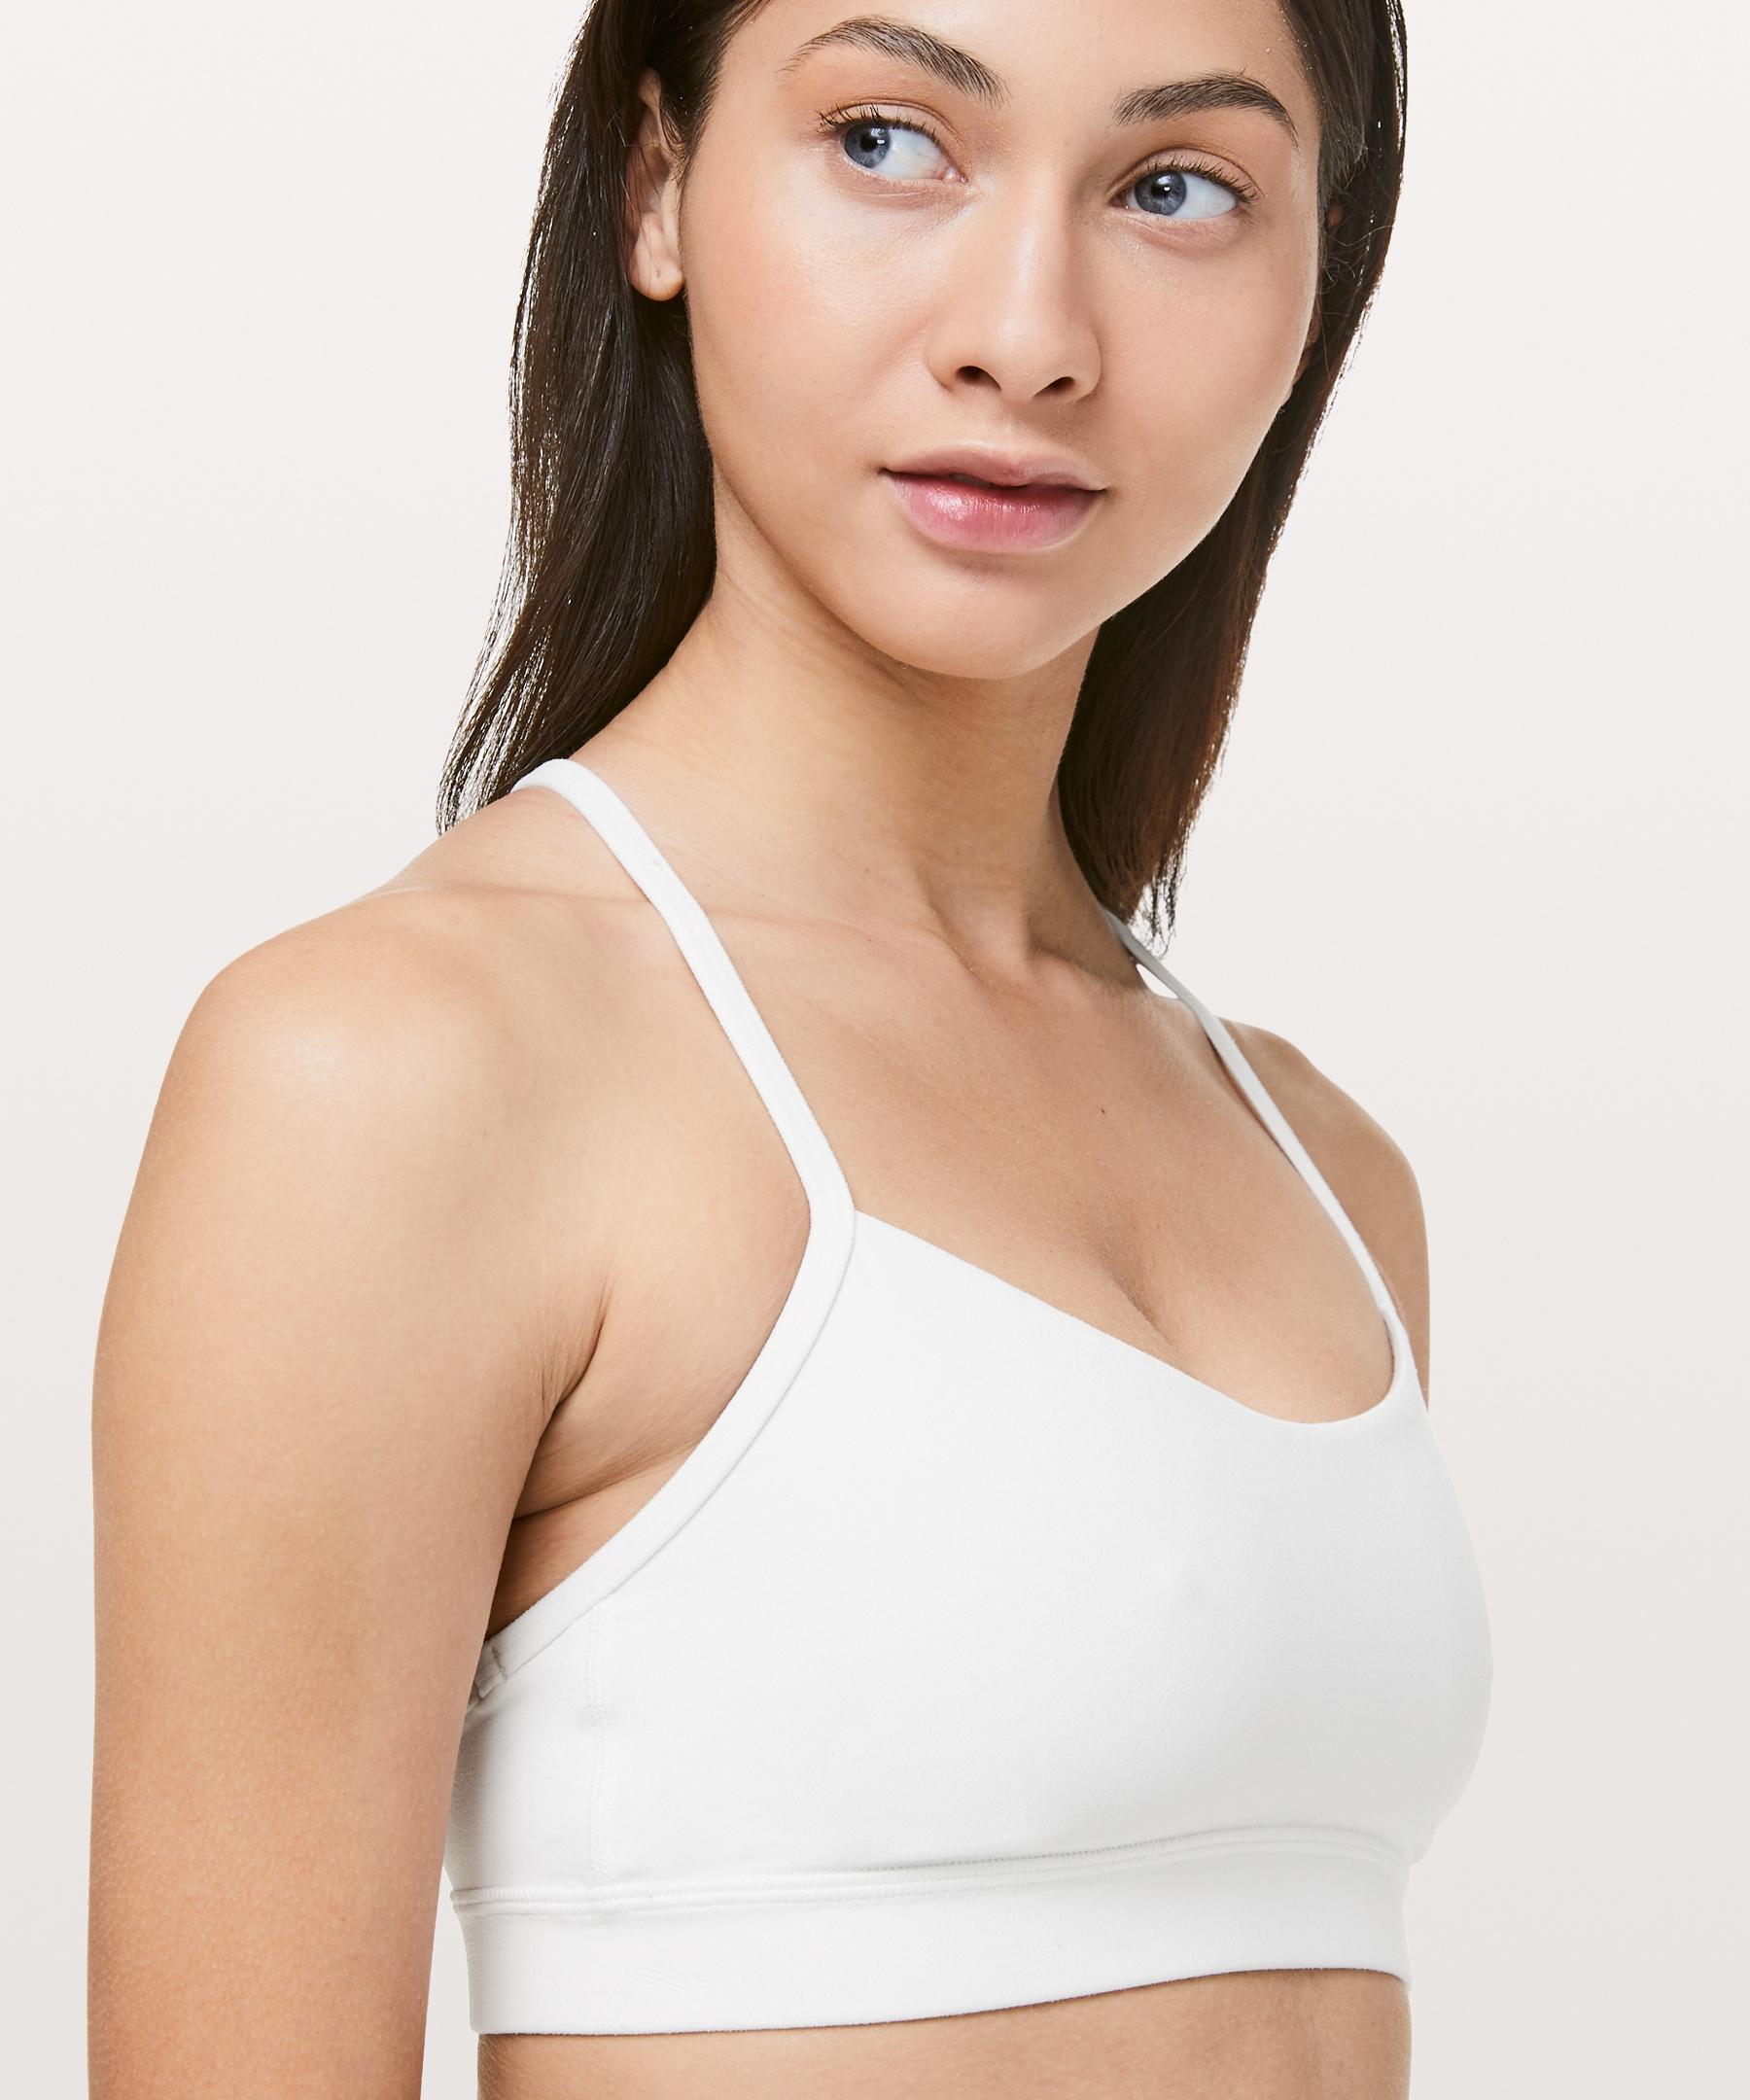 Yoga Bras for Women Padded Strappy Sports Bra - WF Shopping